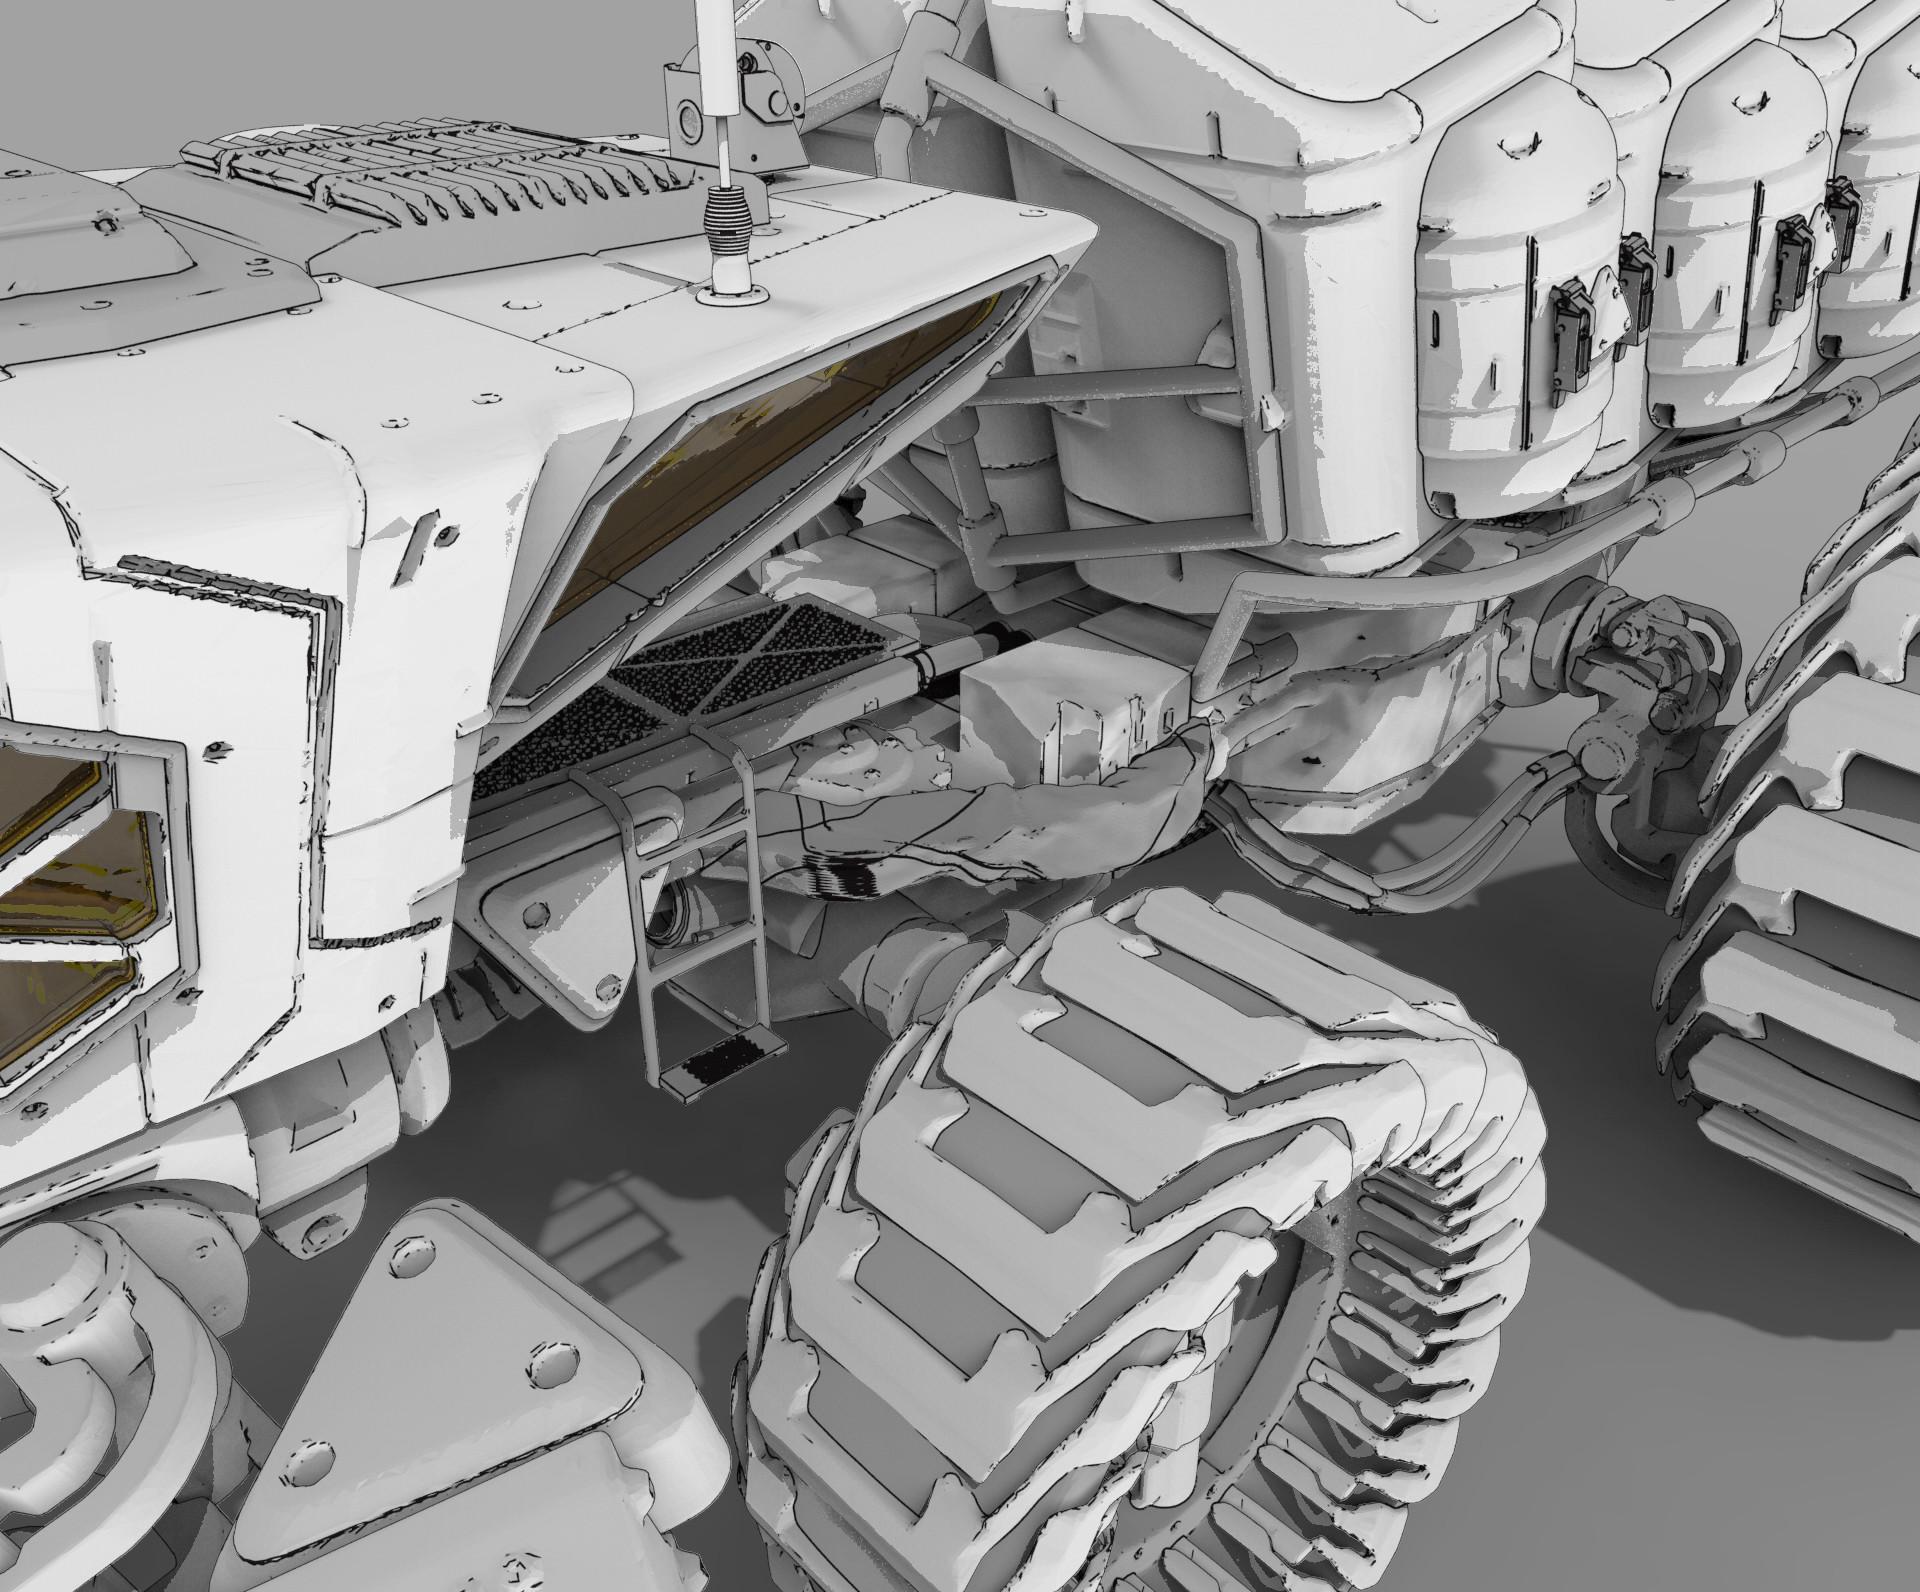 Roberto robert mars buggy kitbash 74